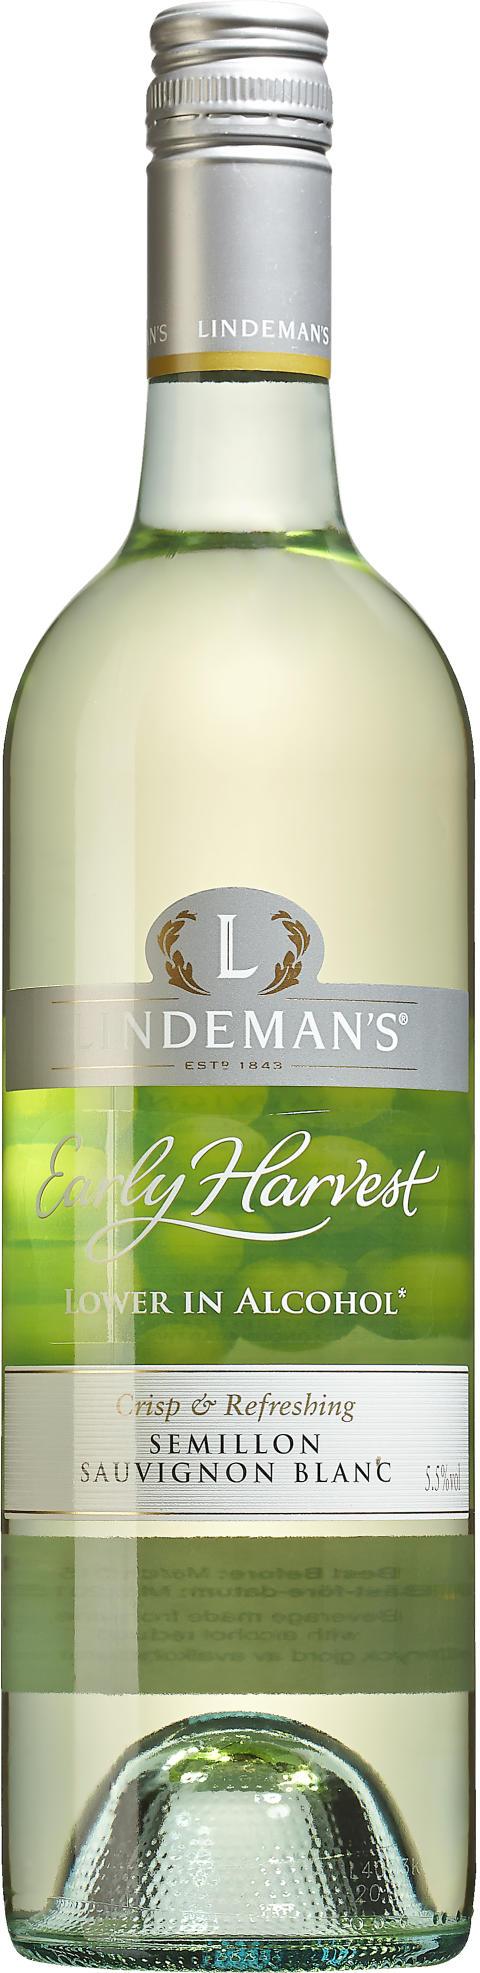 Lindeman's Early Harvest Semillon Sauvignon Blanc